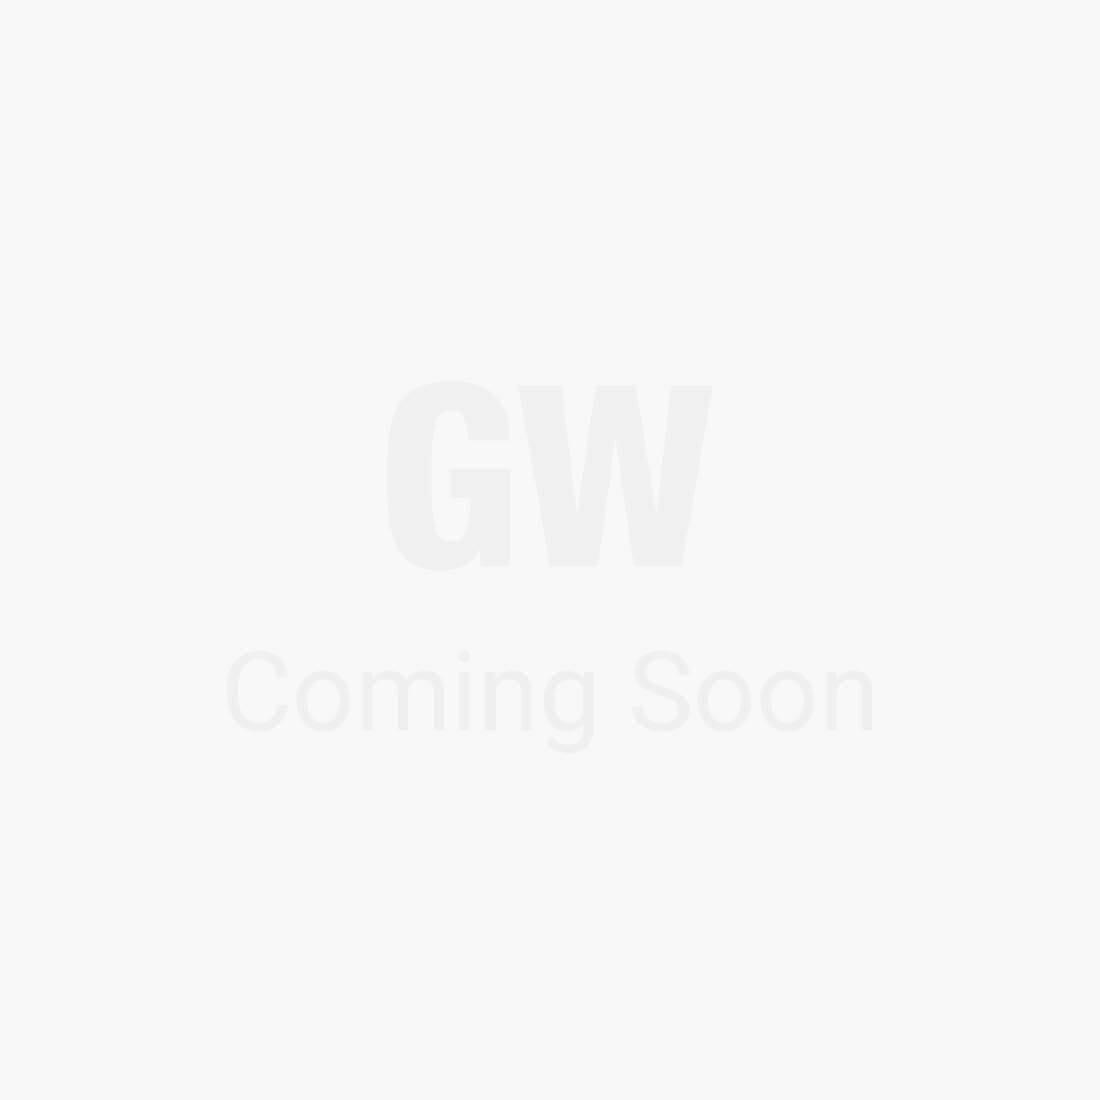 Sidney Fold Sofa Chair